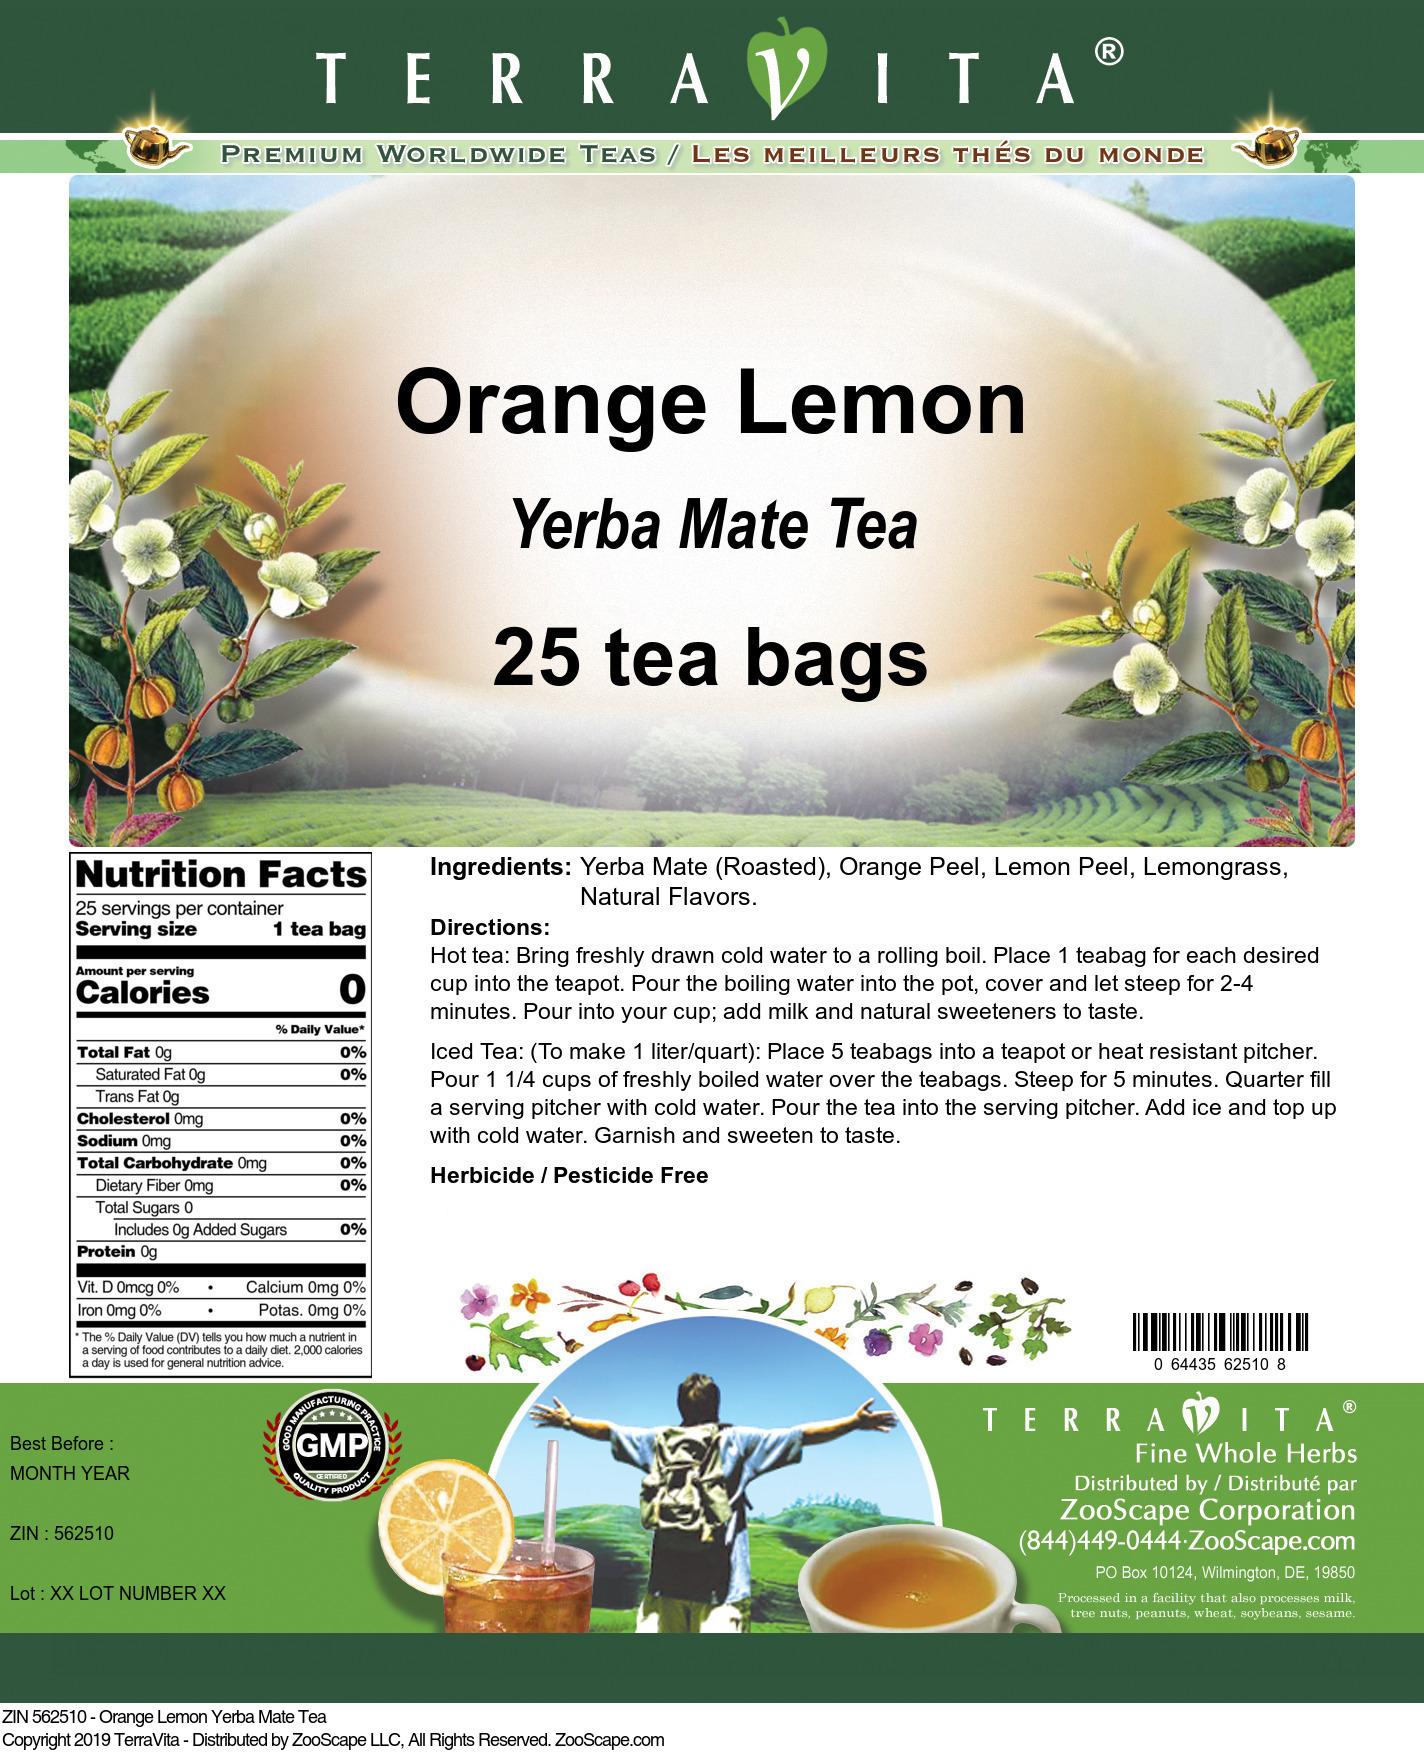 Orange Lemon Yerba Mate